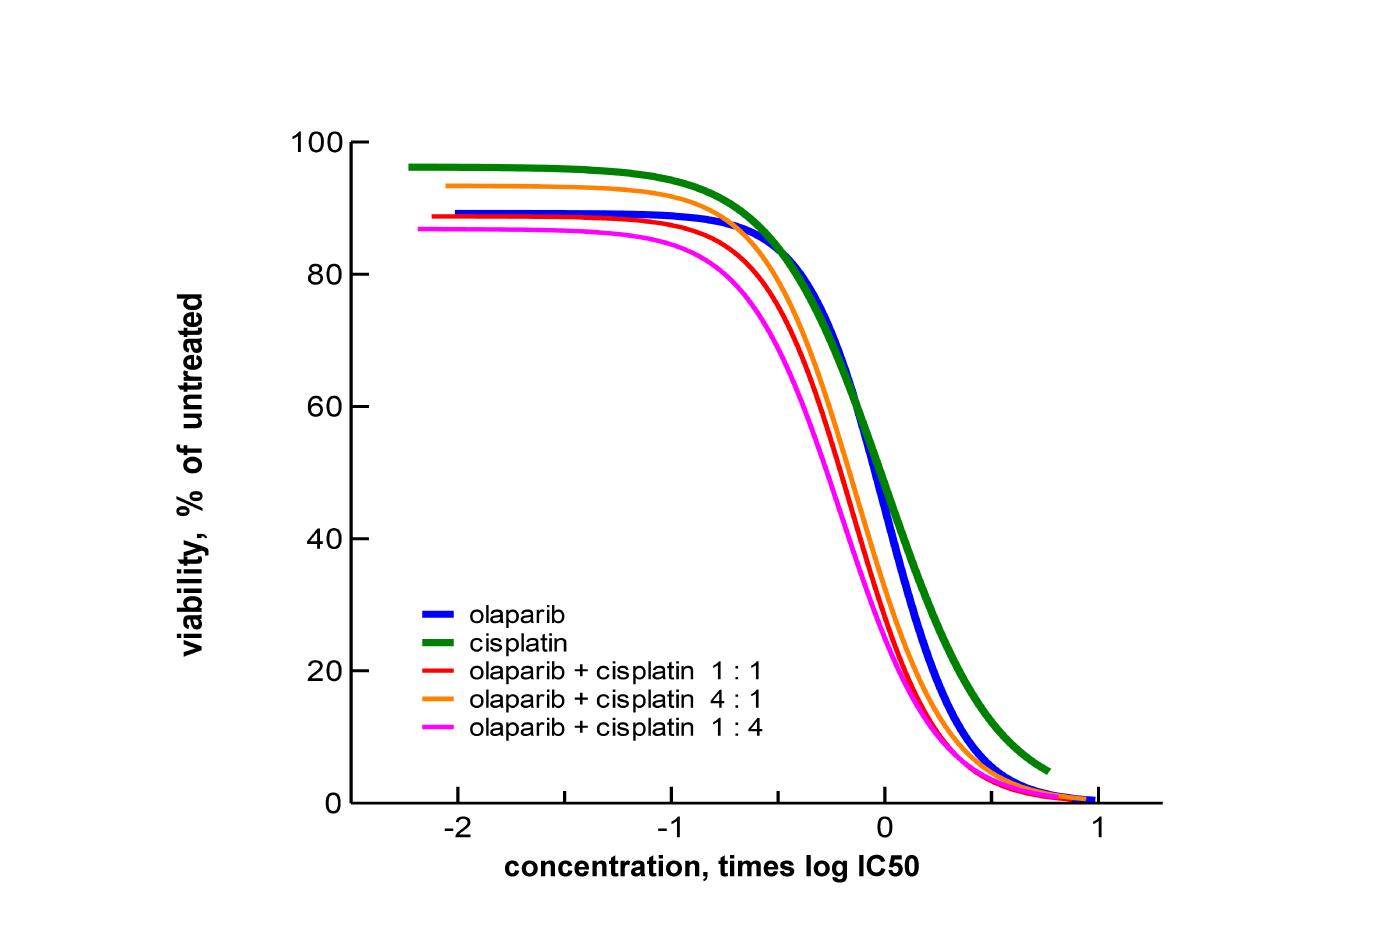 SynergyFinder_olaparib + cisplatin_15SF113